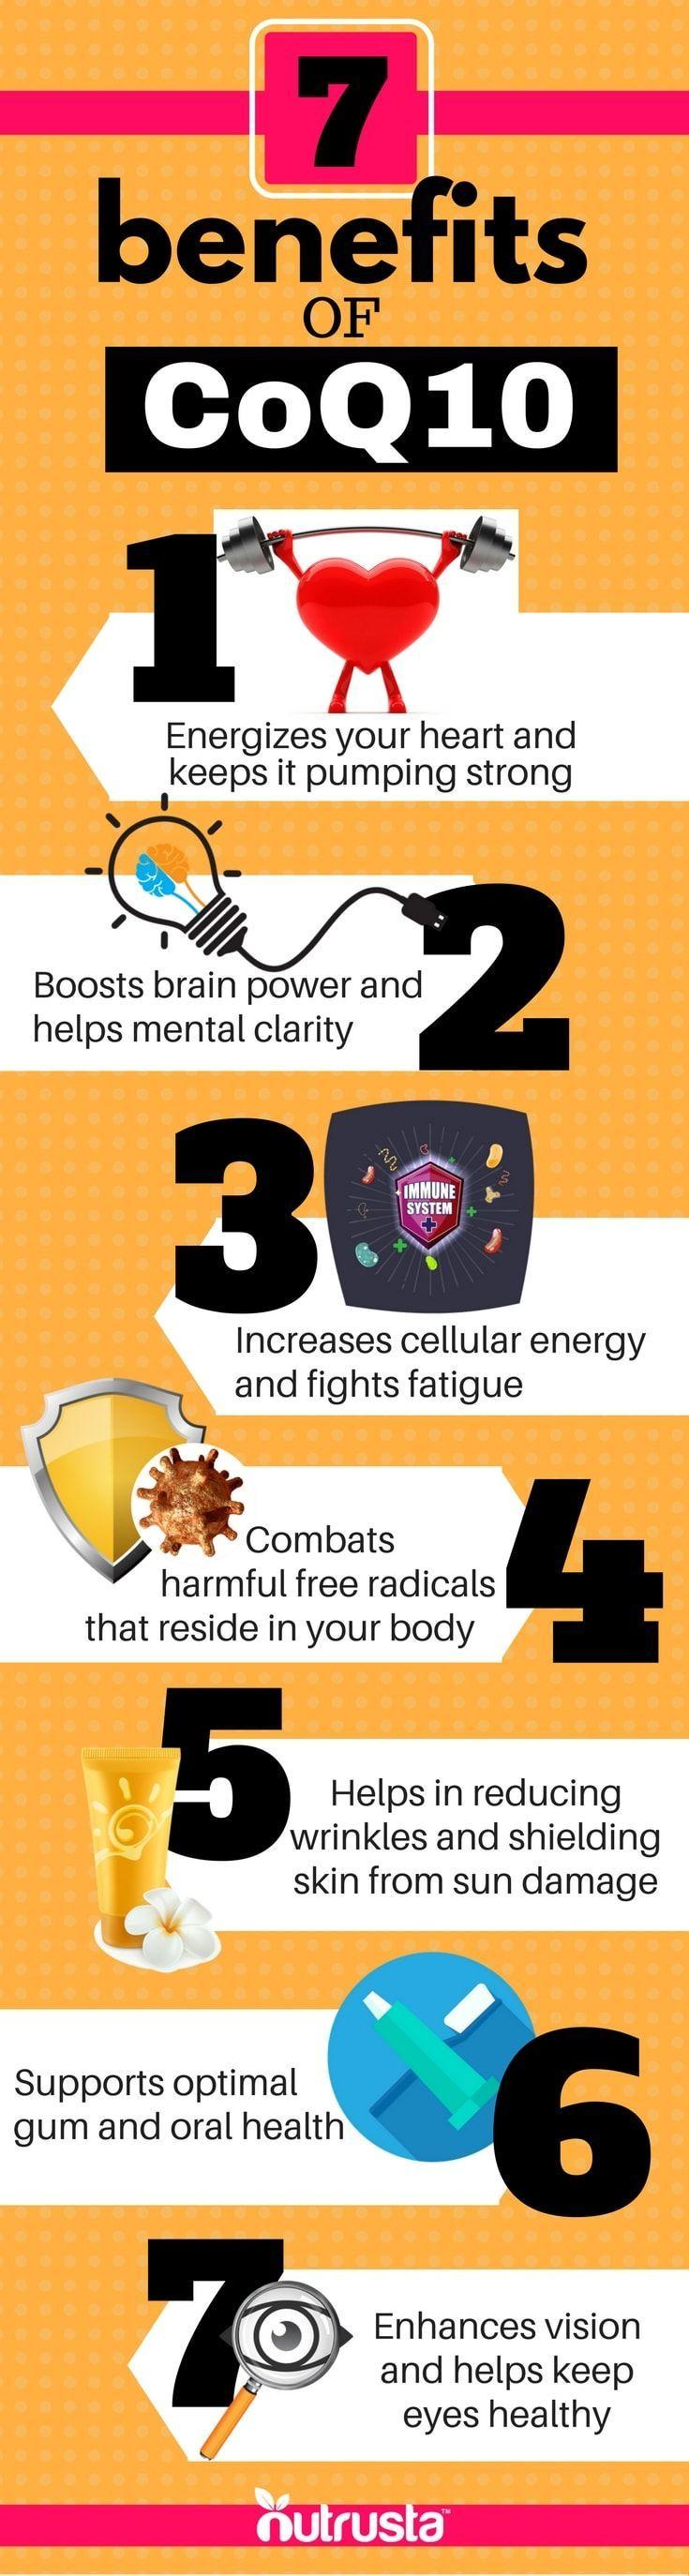 7 Benefits of CoQ10. Heart, brain, eyes, blood pressure, skin, fertility, gums